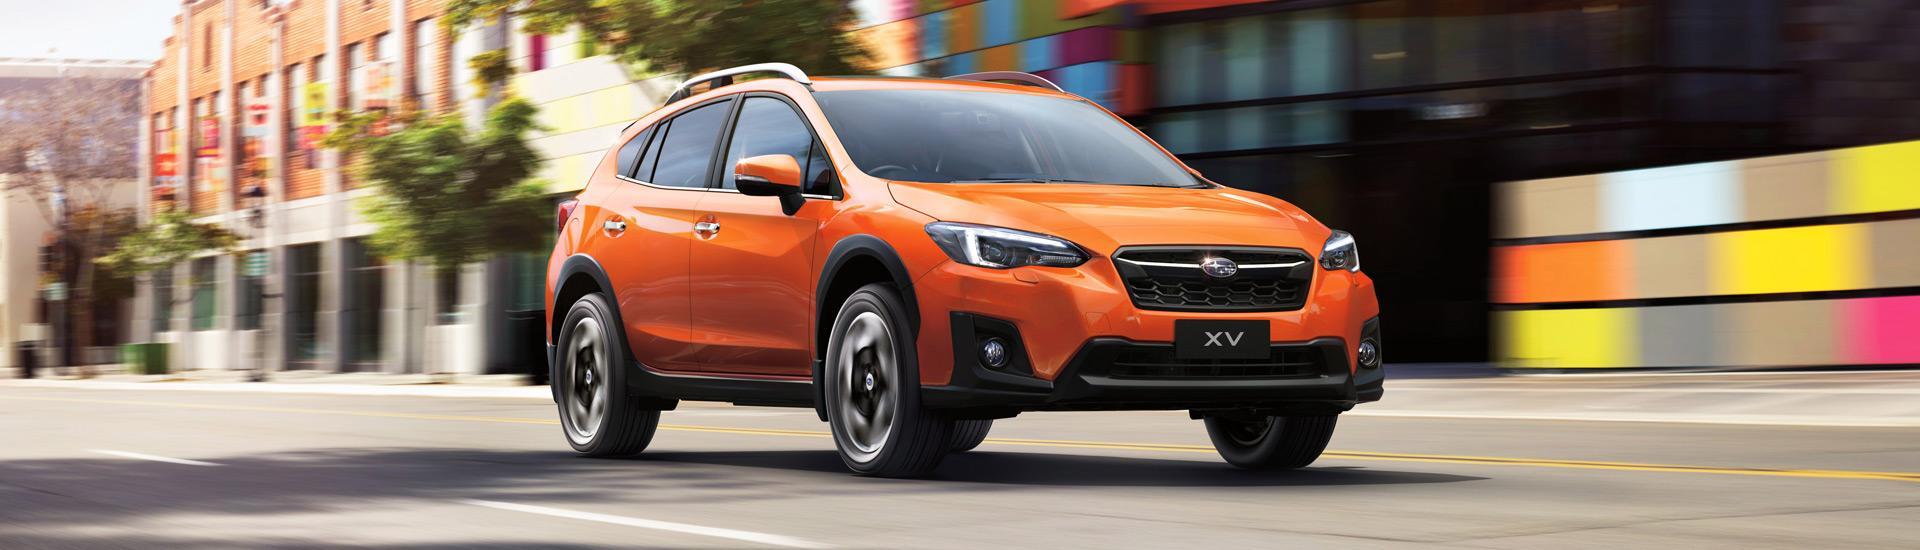 New Subaru XV SUV Cars For Sale - carsales.com.au